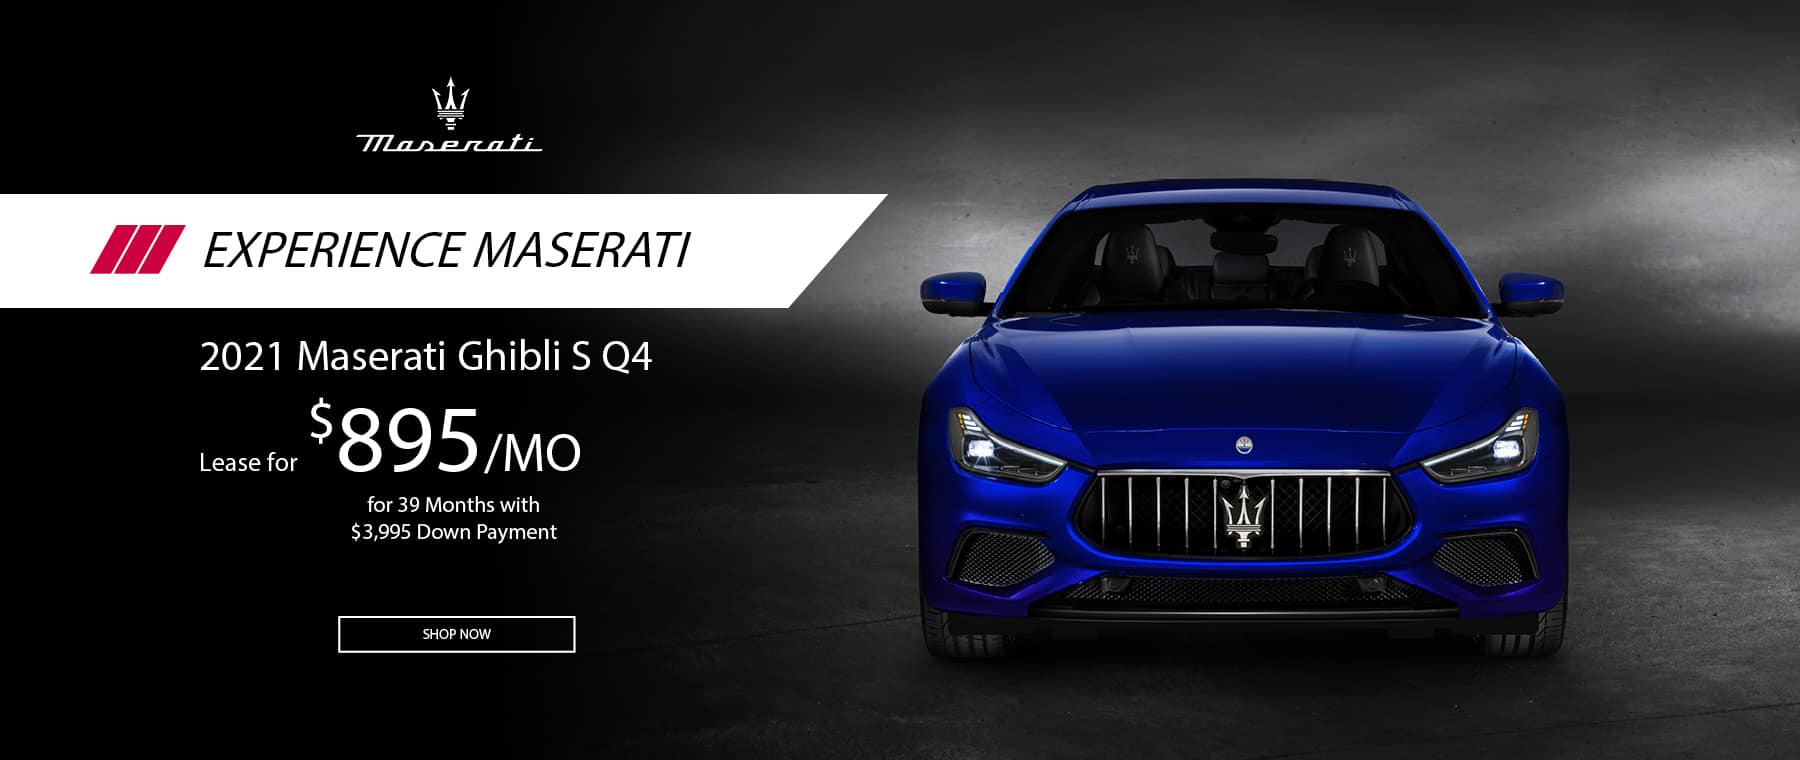 MaseratiCNJ_Offer_ExperienceMaserati_June21_22254 (2) (1)